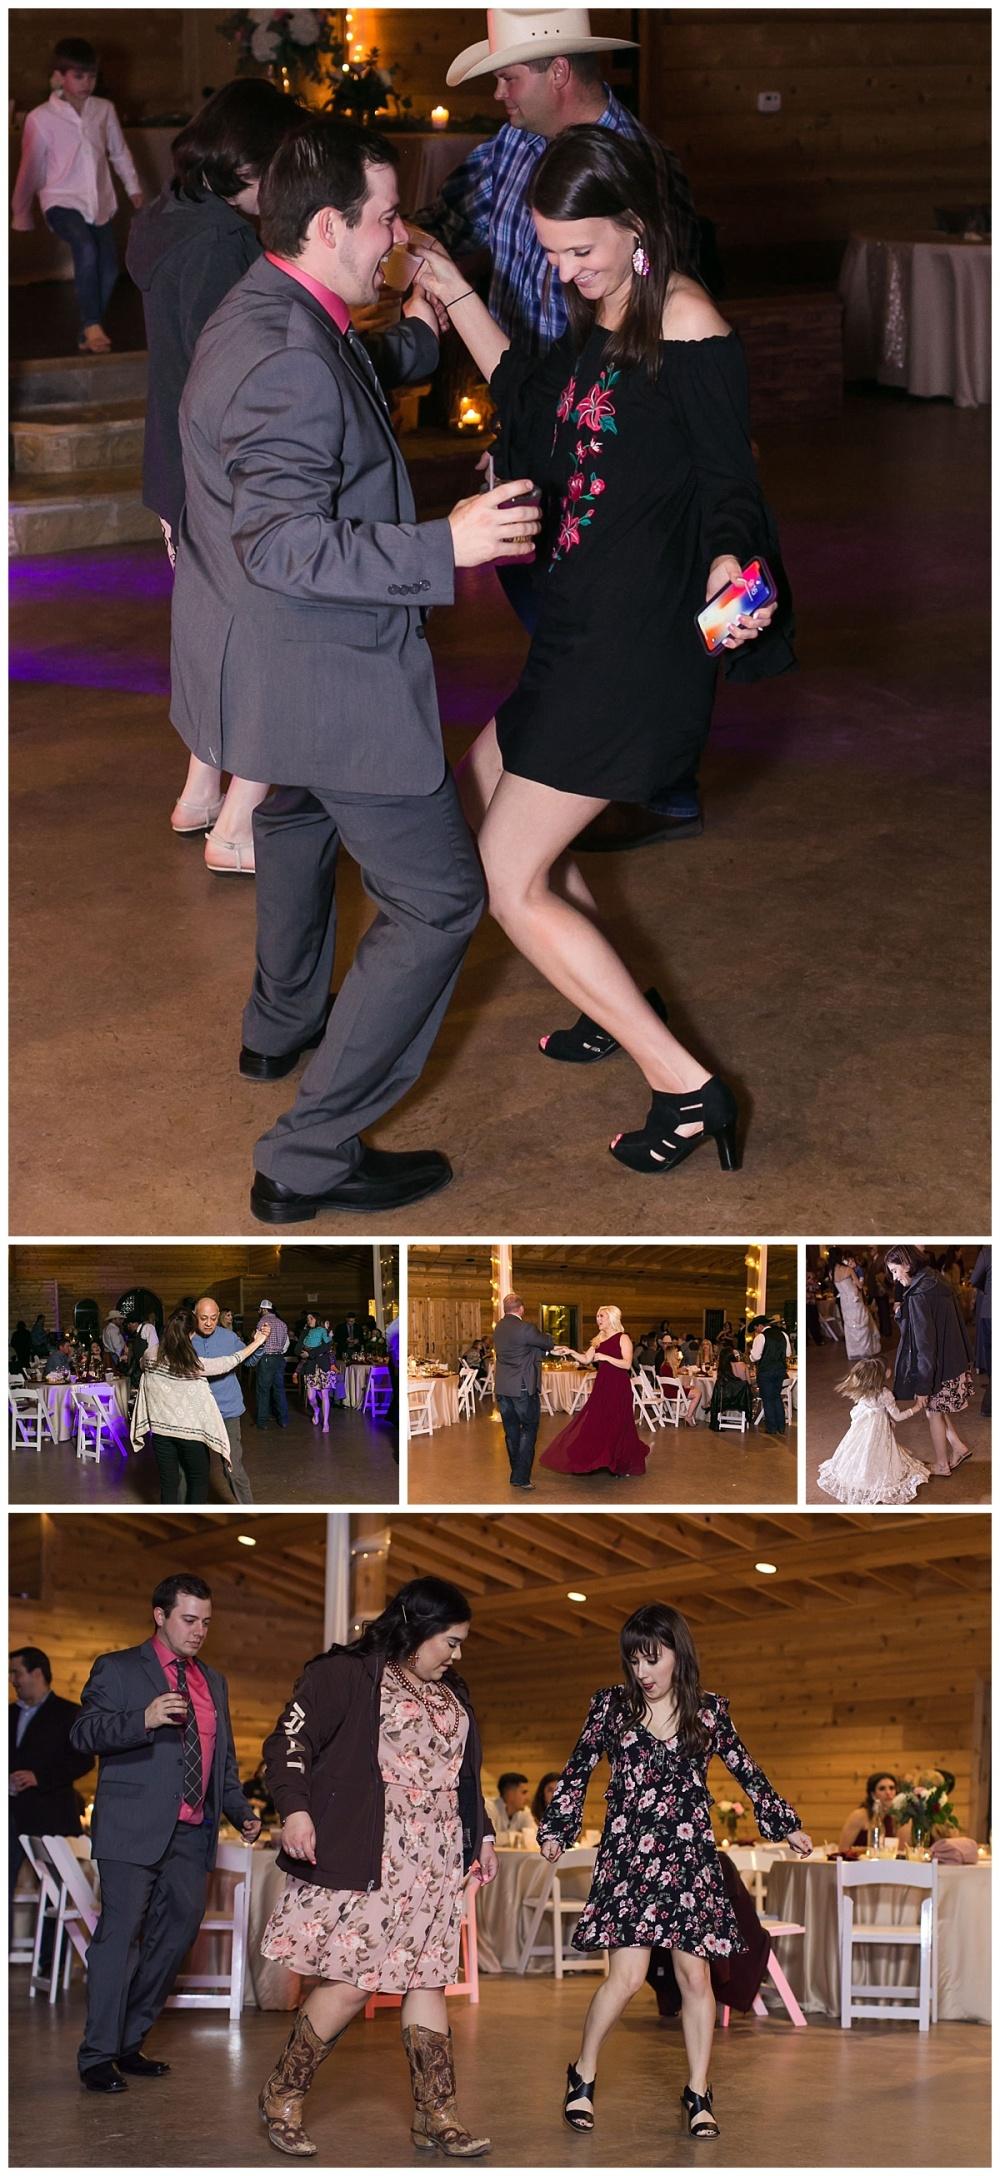 Carly-Barton-Photography-Geronimo-Oaks-Wedding-Venue-Texas-Hill-Country-Ronnie-Sarah_0123.jpg